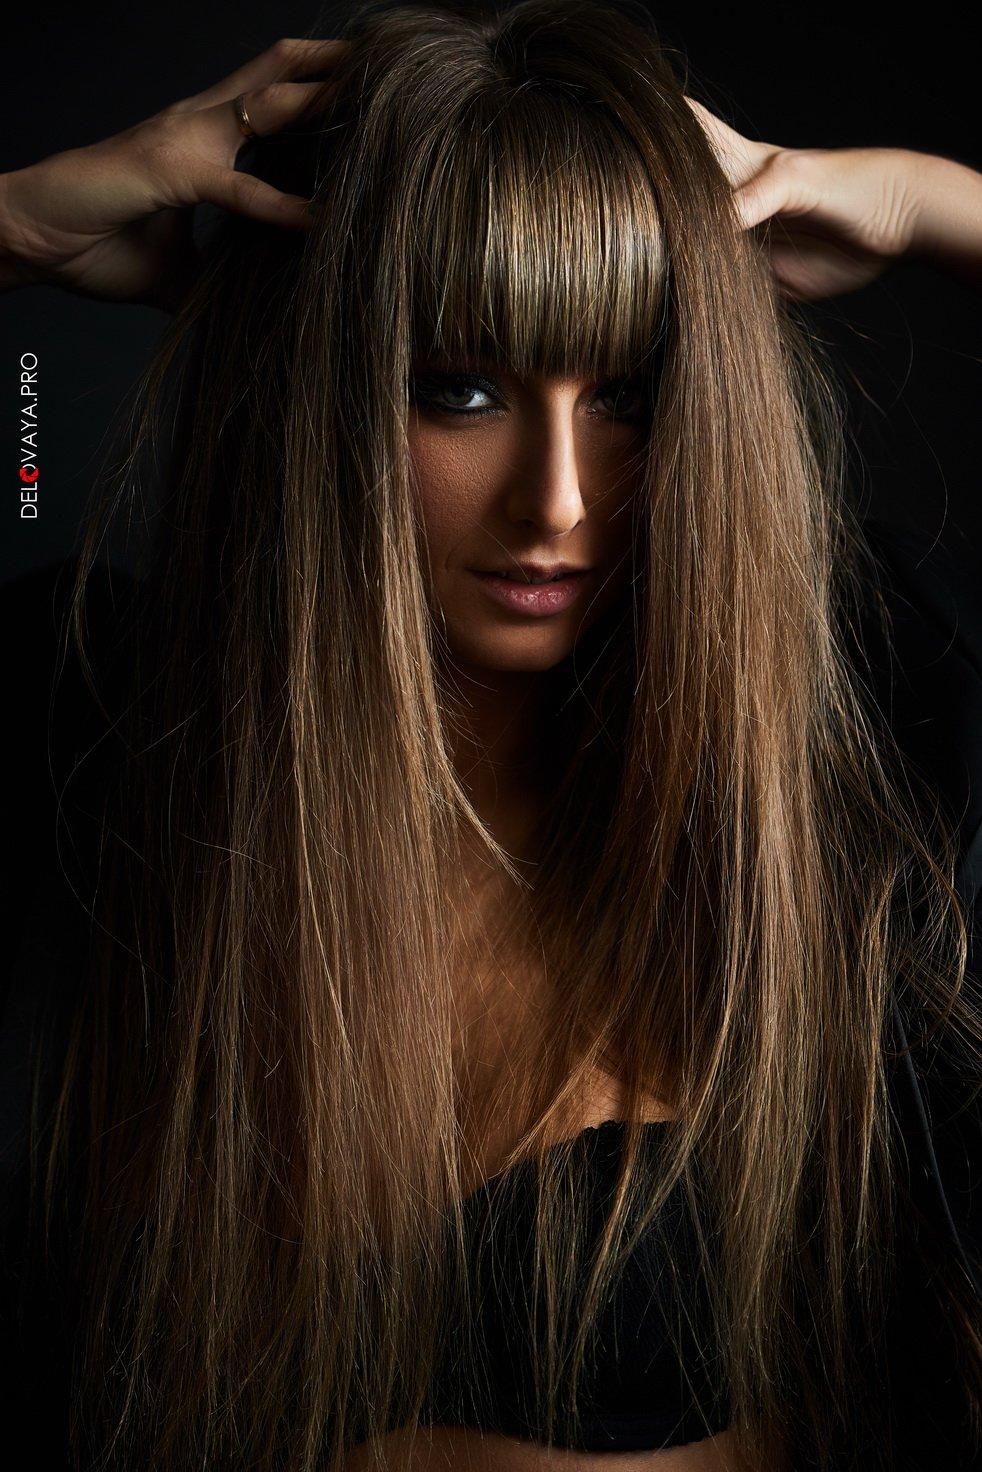 девушка, студия, фотосессия, портрет, beauty, girl, woman, взгляд, модель, nikon, shot, delovayapro, delovaya, word, мир, Матвеева Вероника